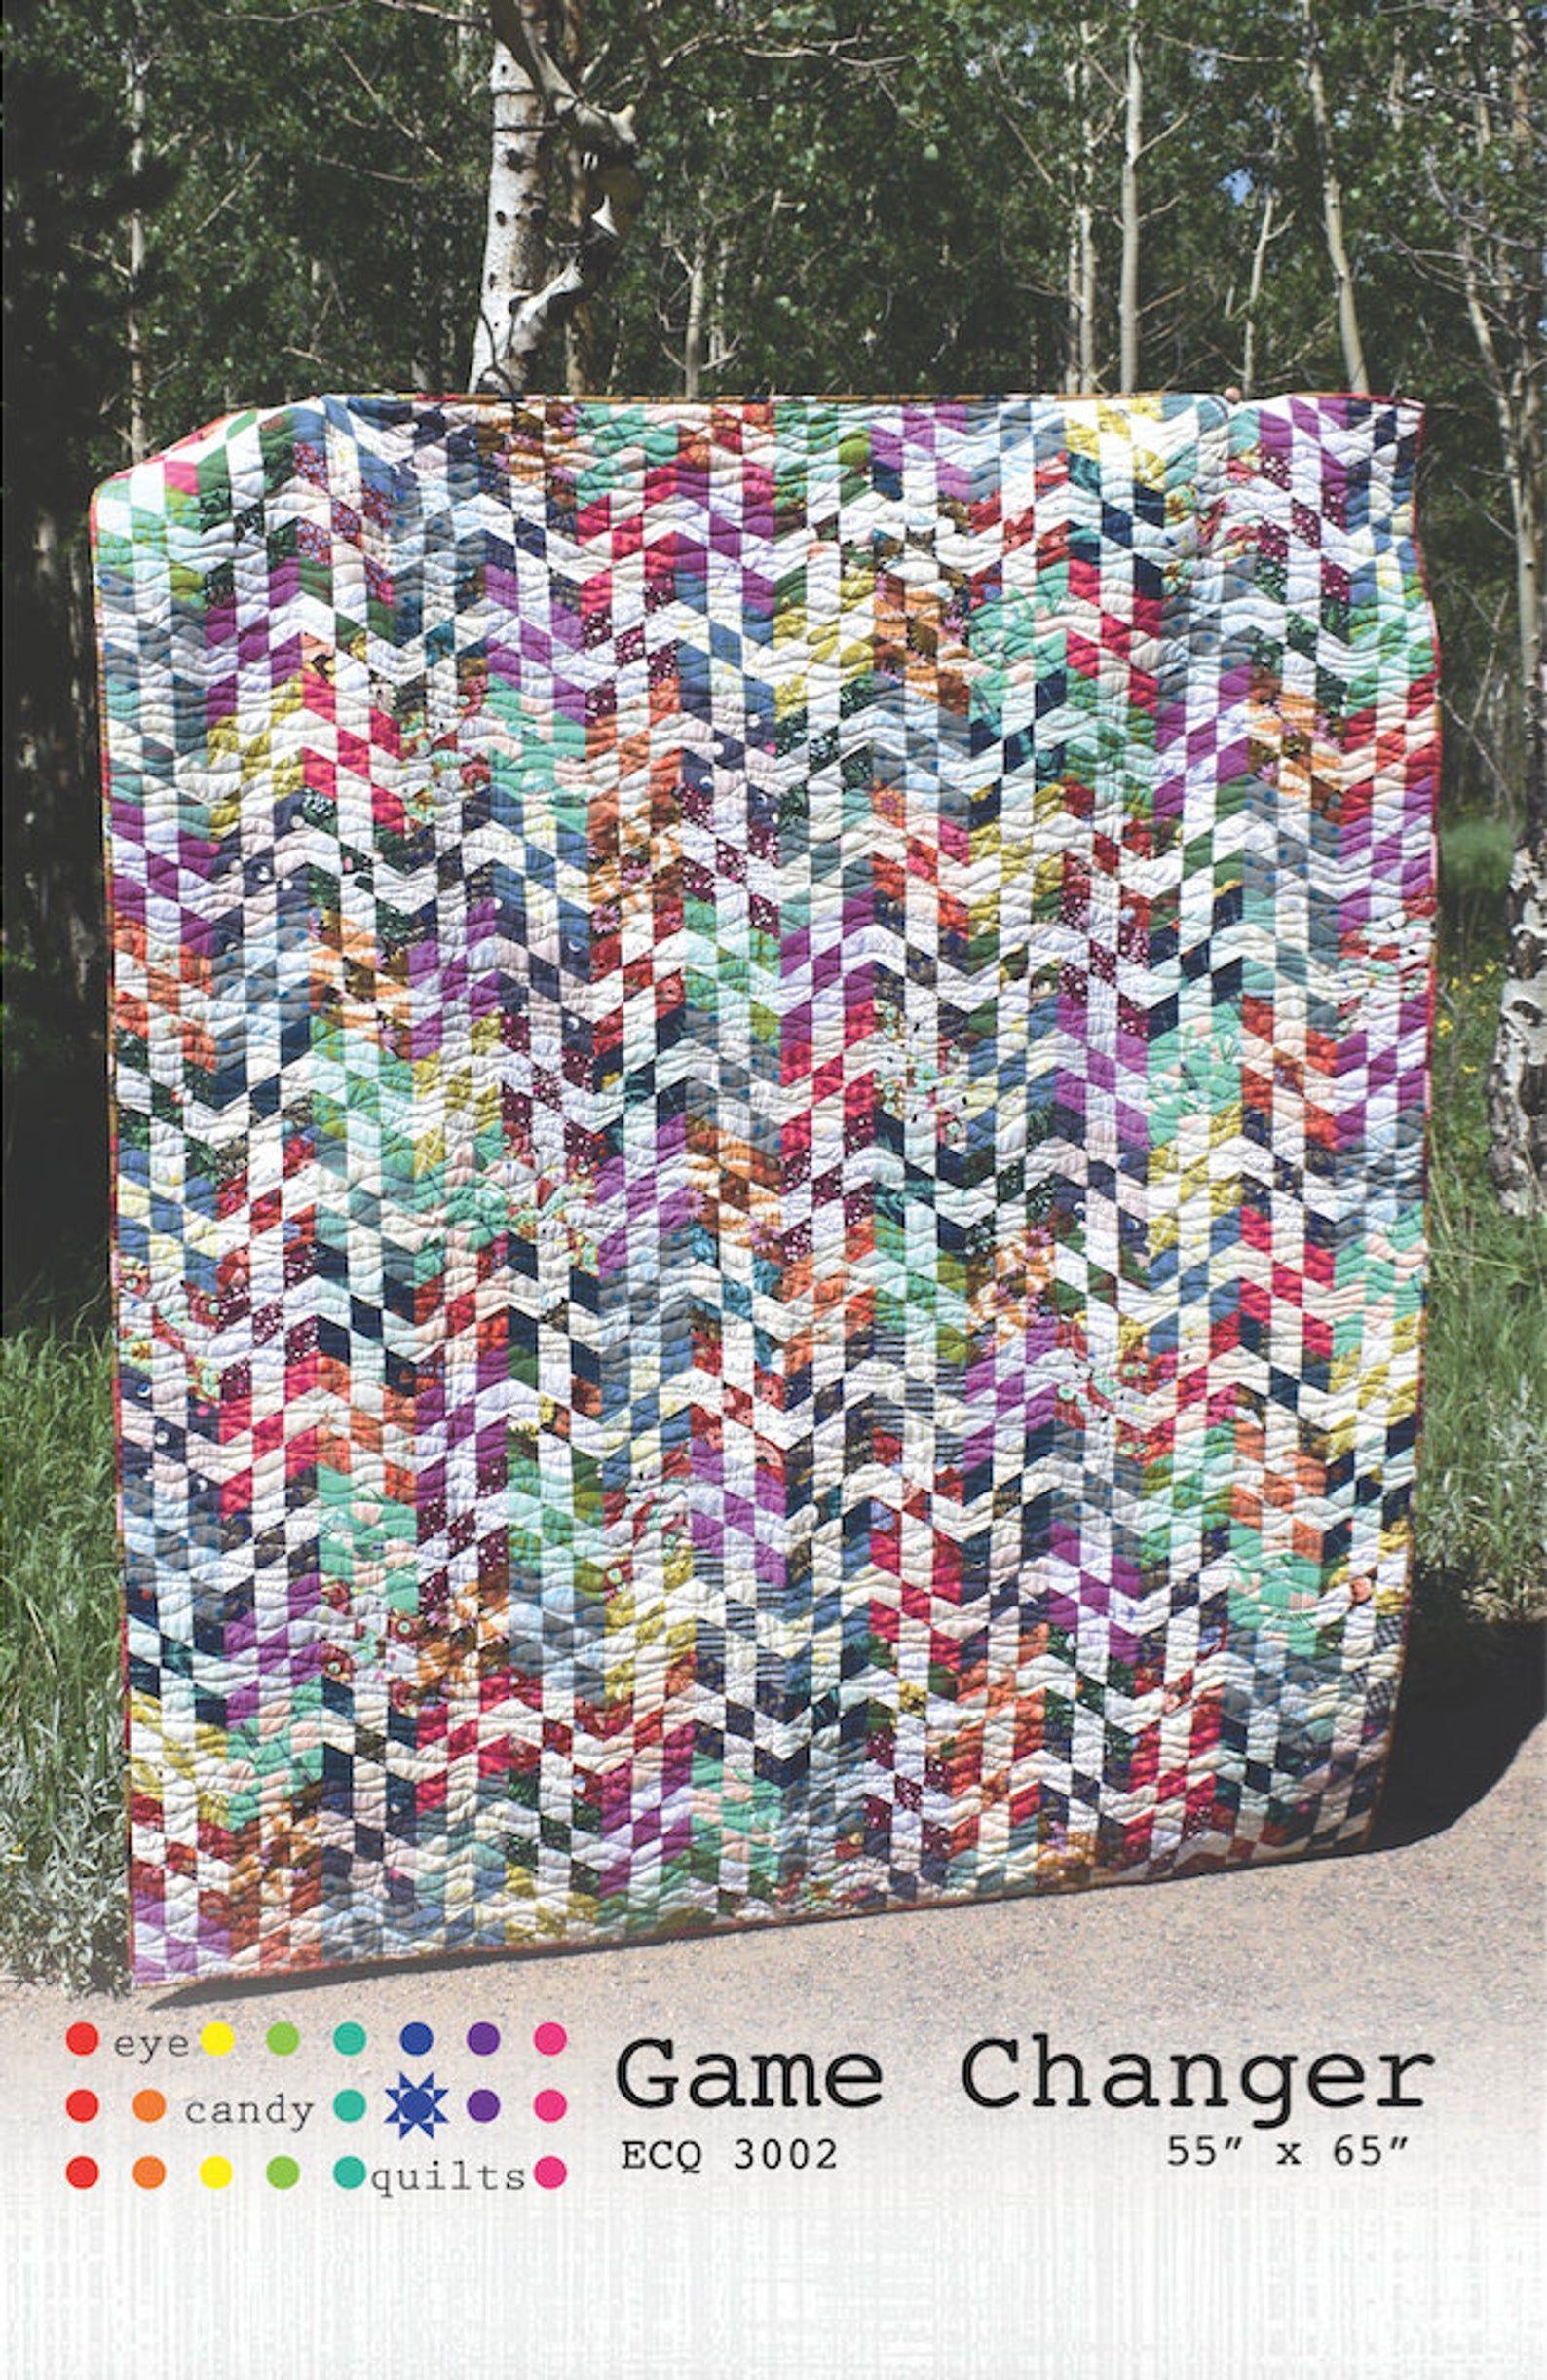 Game Changer Throw Quilt Pattern Quilt patterns, Quilts